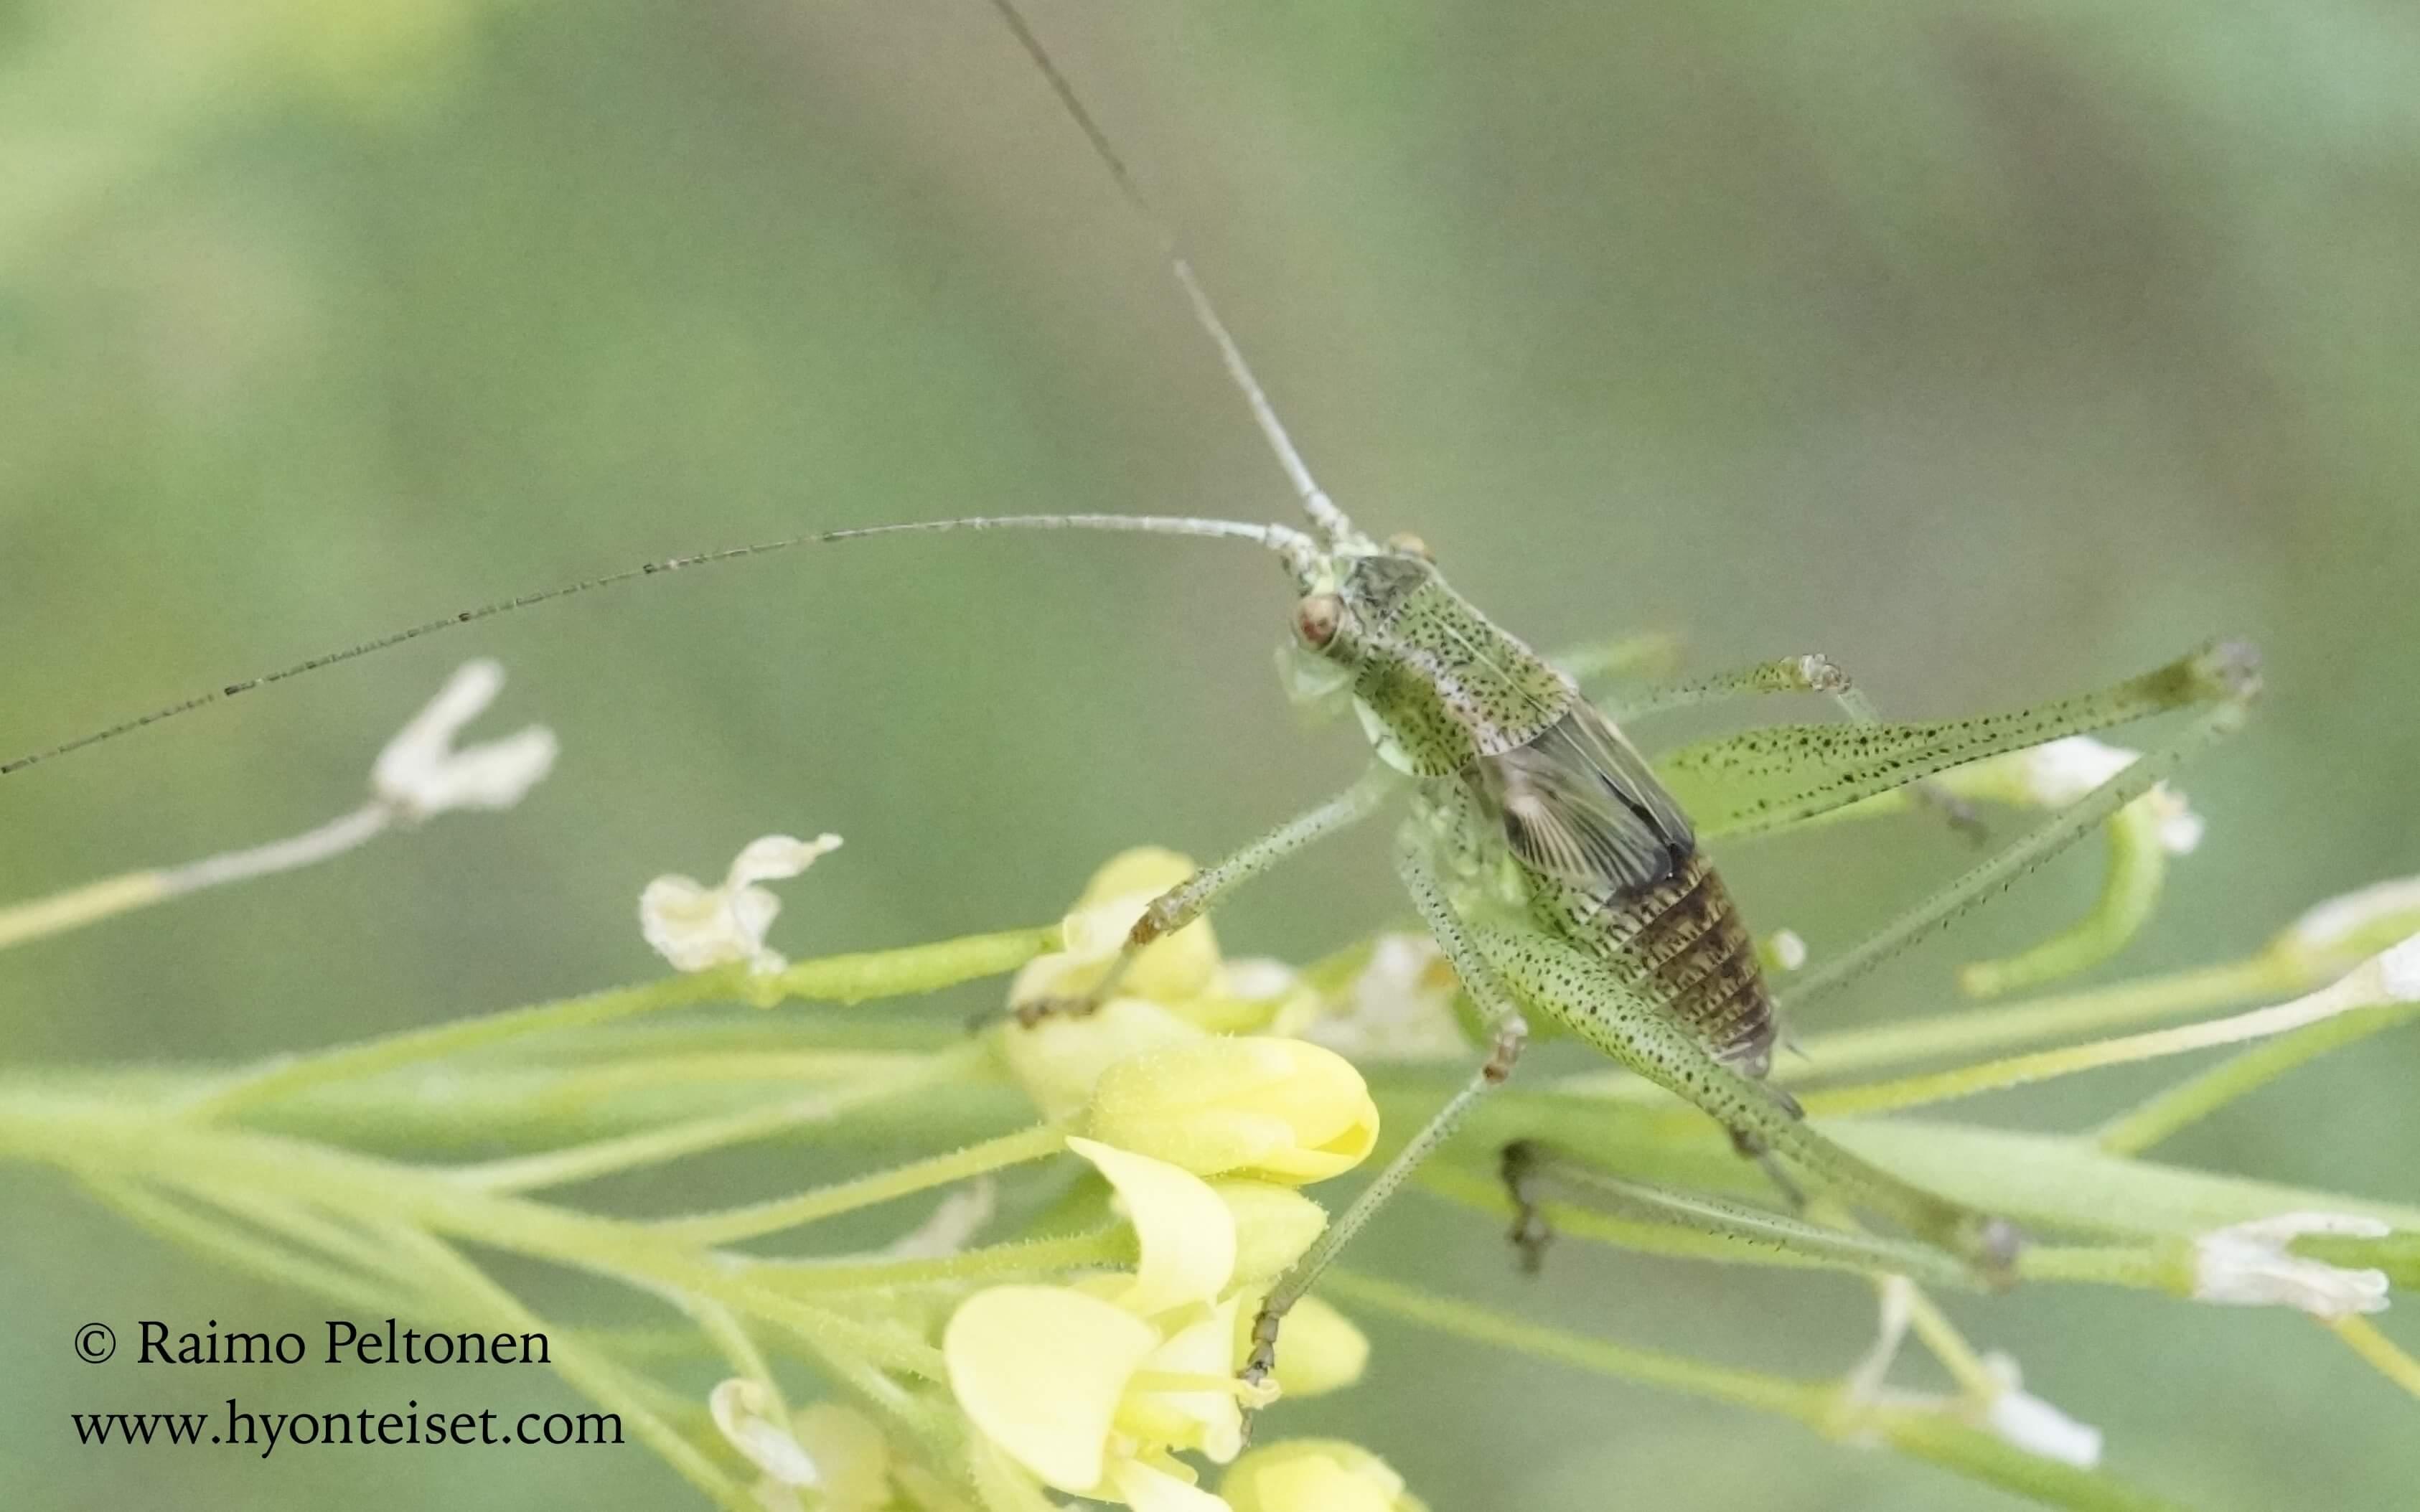 Tettigoniidae sp., nymfi GRAN CANARIA